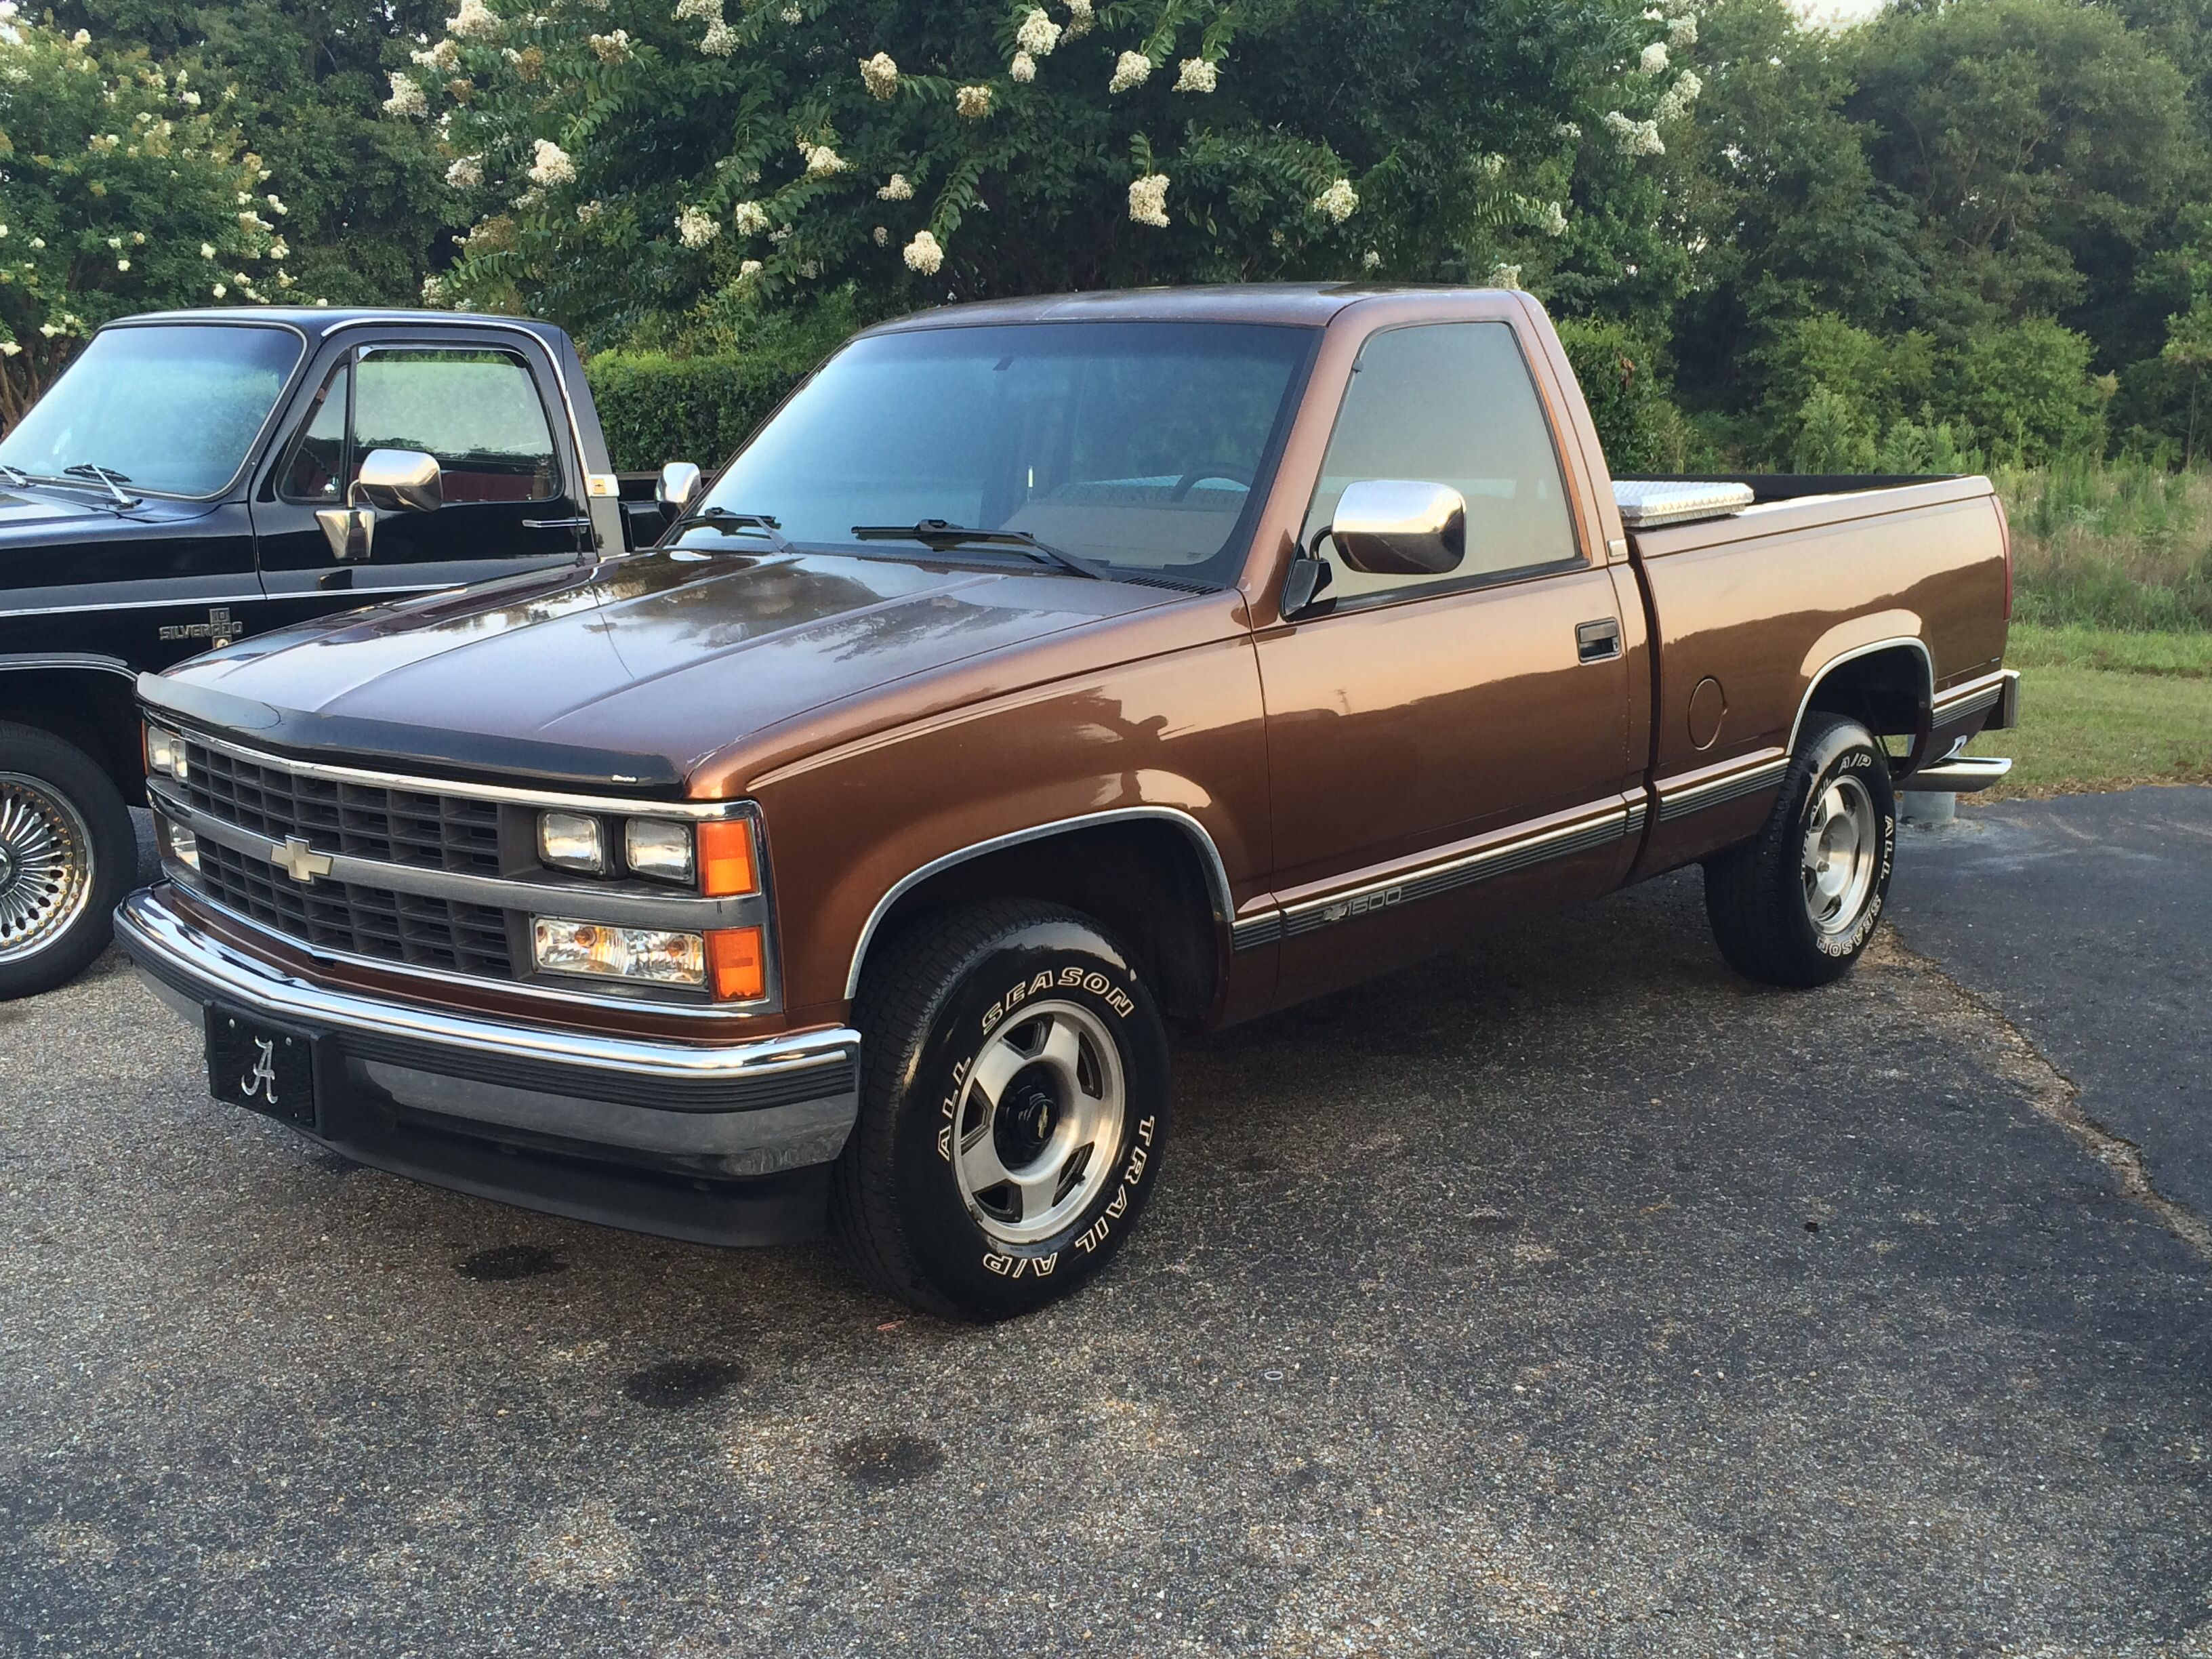 1989 Chevy Silverado  cars trucks n vehicles  Pinterest  1989